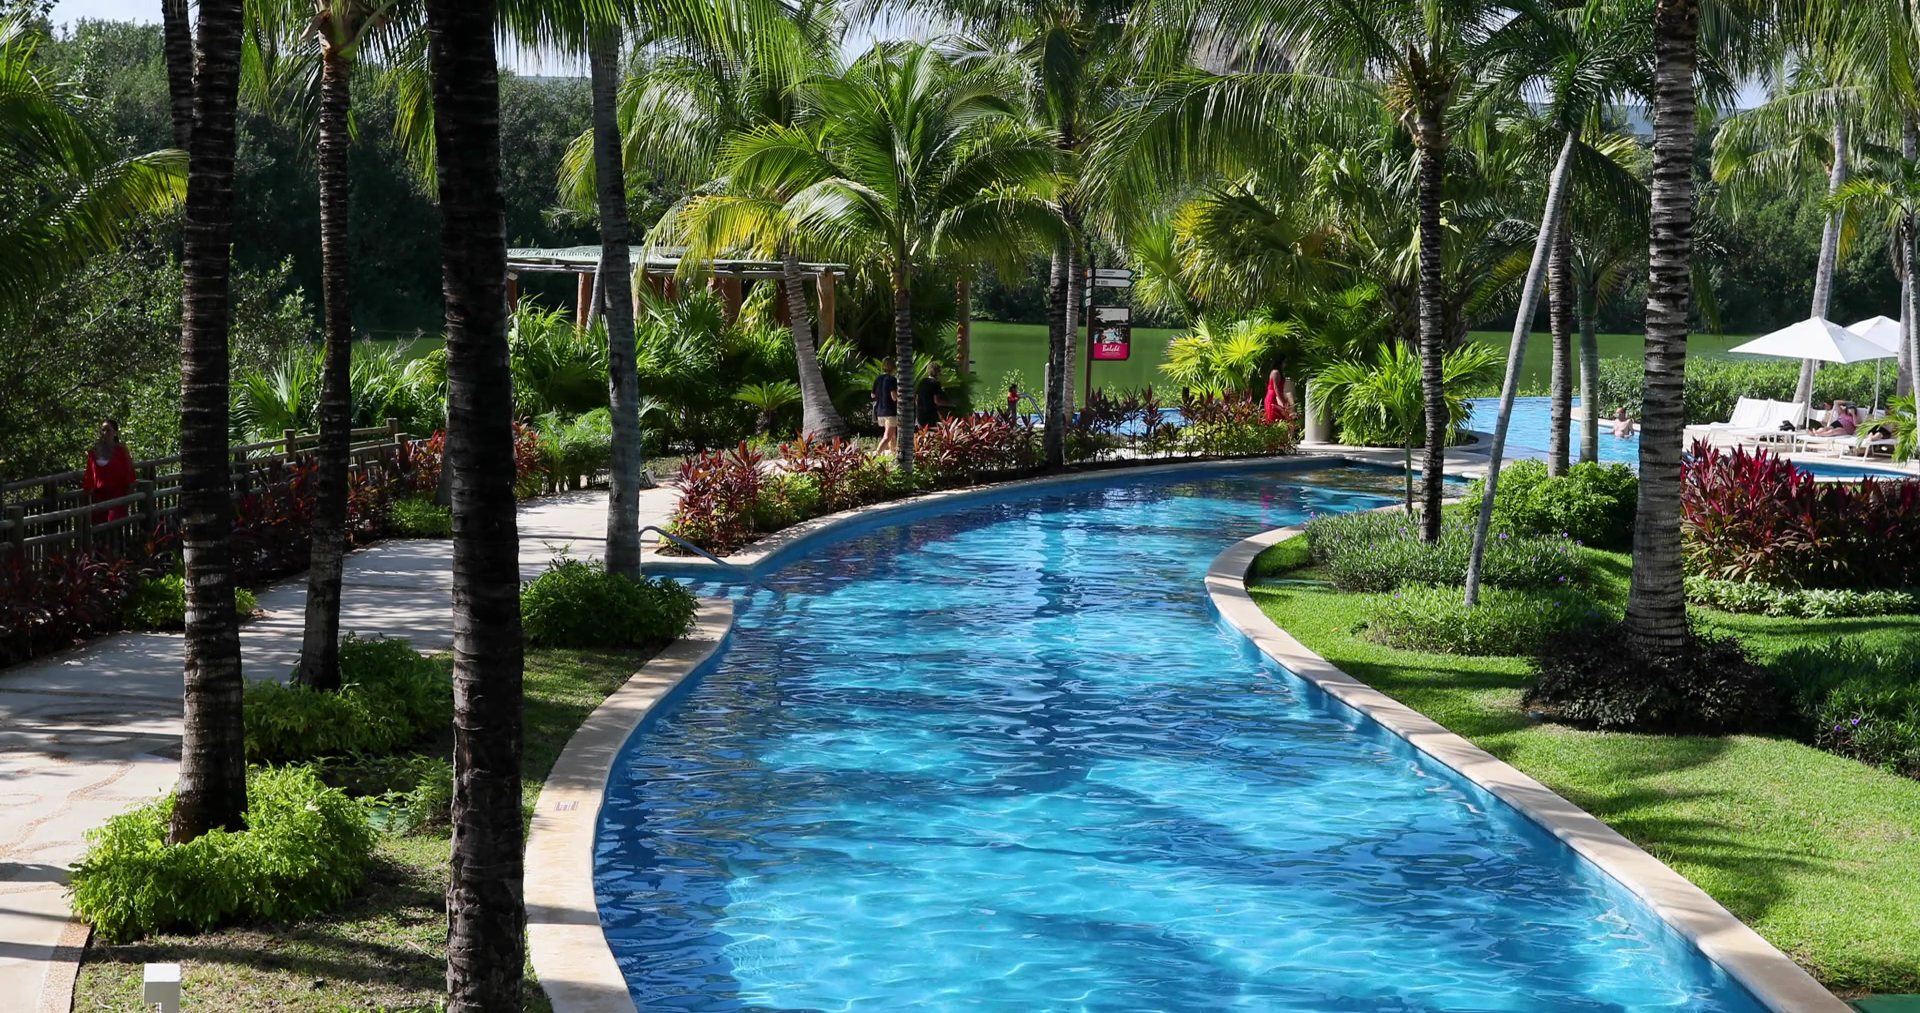 Mexico Bridge Over Beautiful Tropical Swimming Pool Dci 4K 404 ...